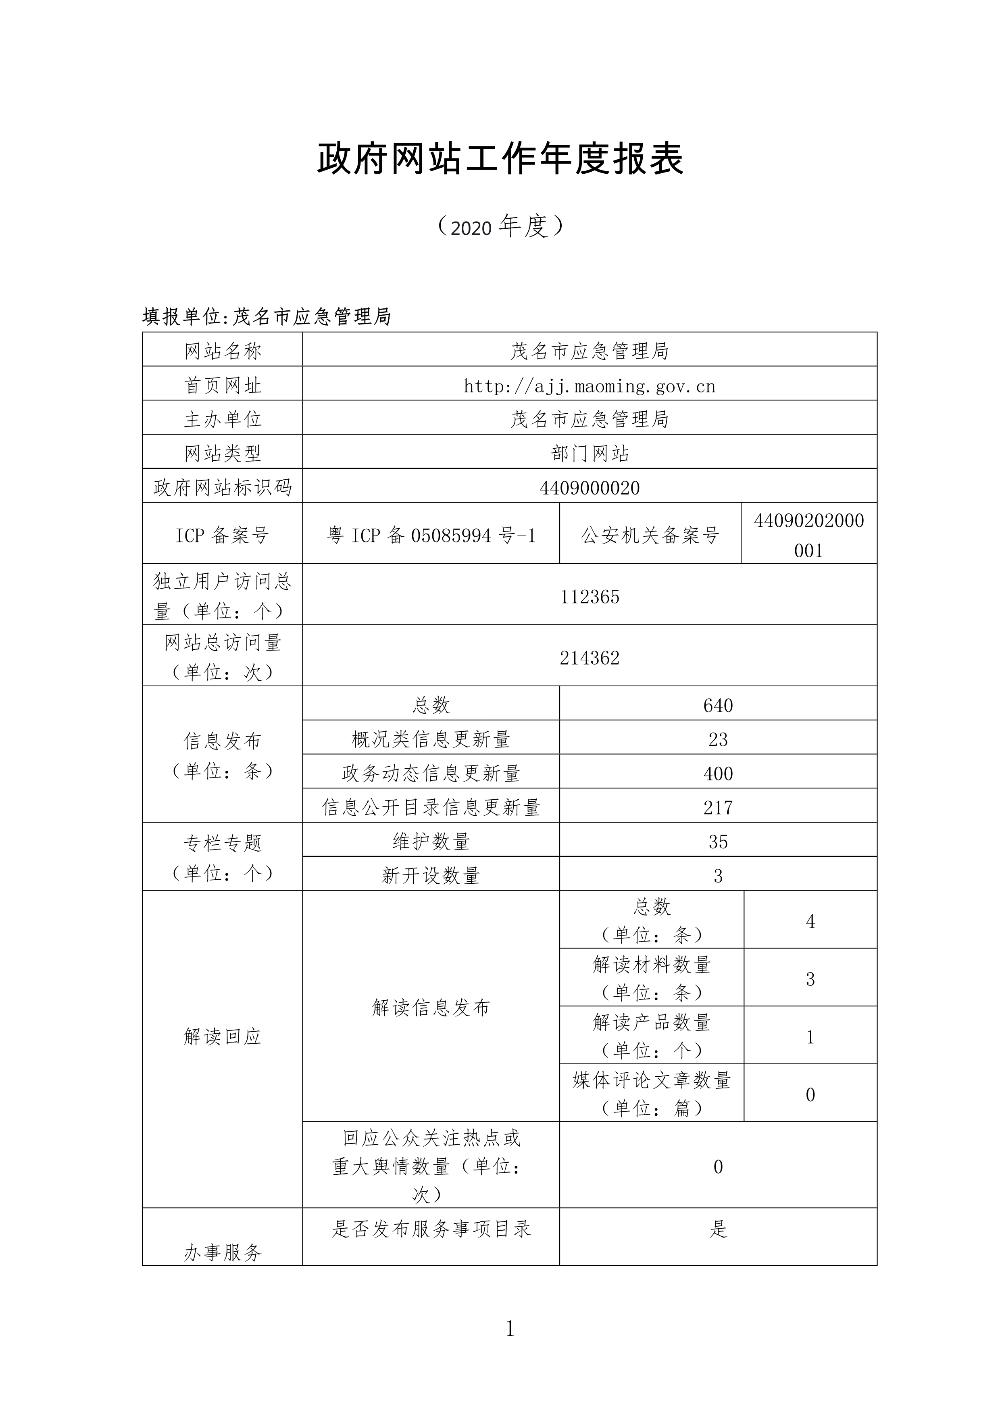 report_tb_4409000020_1.jpg